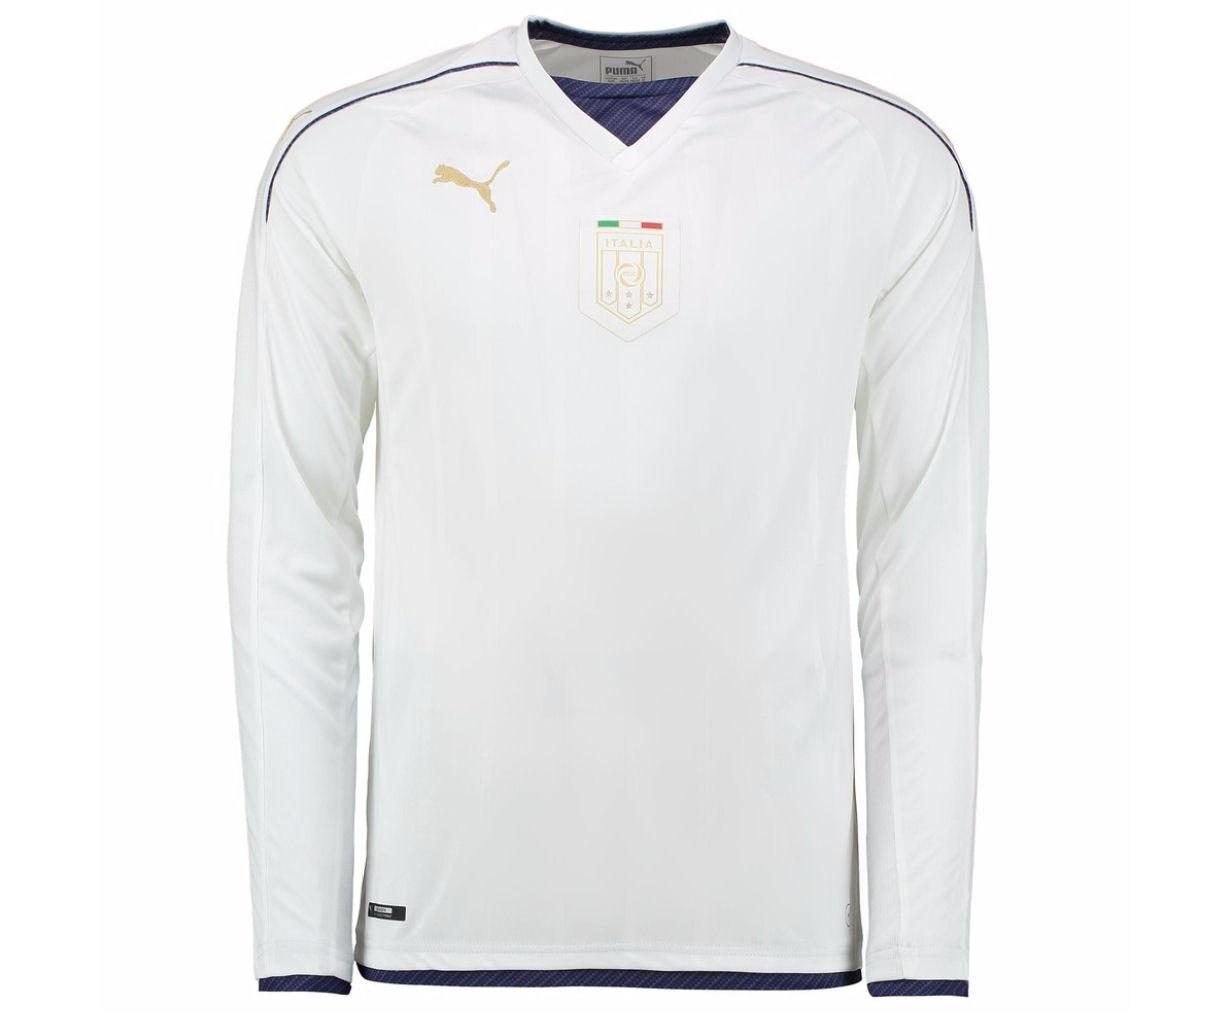 7cbe689b55 Italy 2006 Puma Tribute Away Long Sleeve Shirt